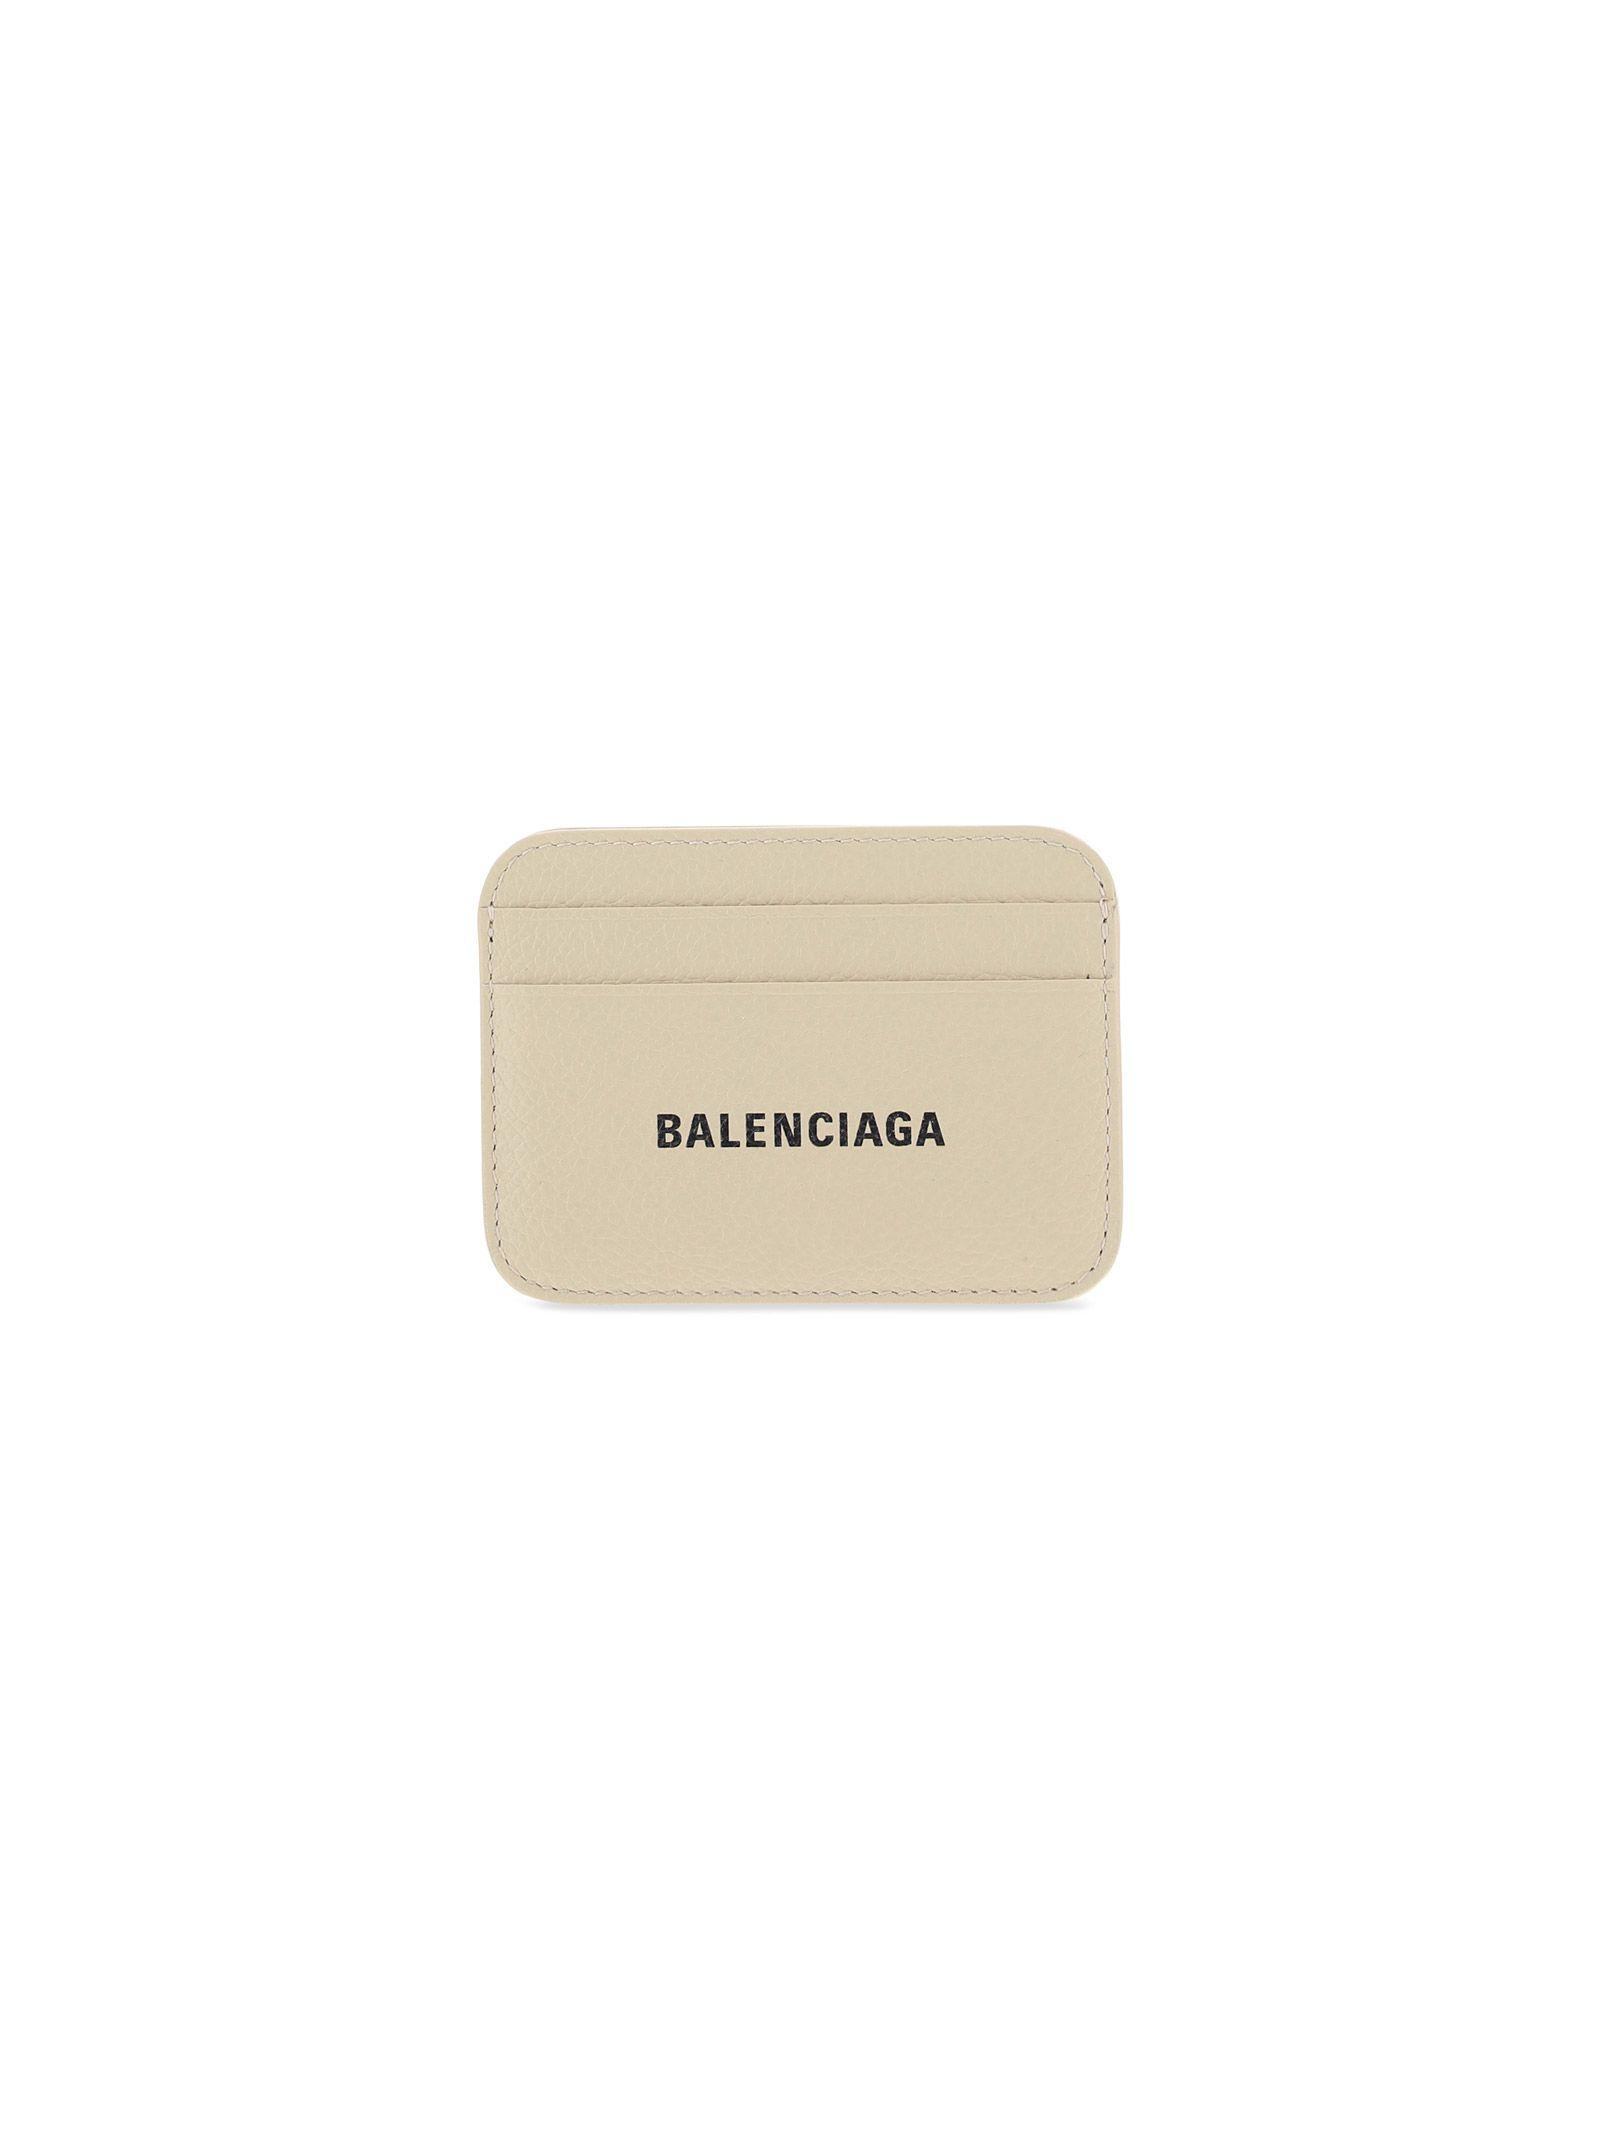 Balenciaga Cardholders BALENCIAGA WOMEN'S BEIGE OTHER MATERIALS CARD HOLDER